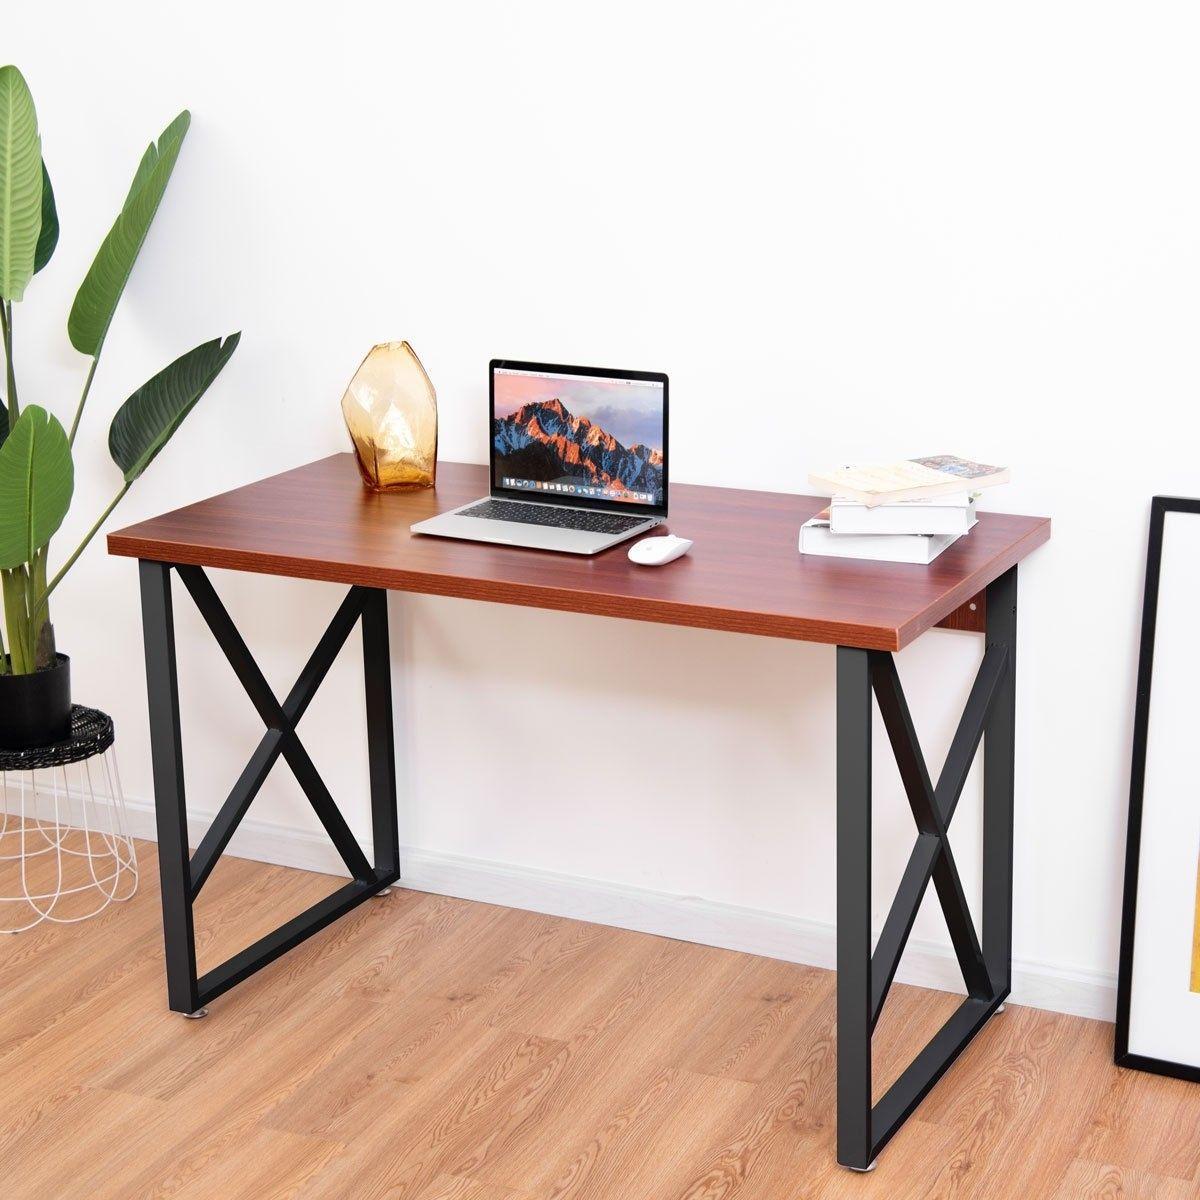 Wooden Pc Laptop Table With Metal Legs Escritorios